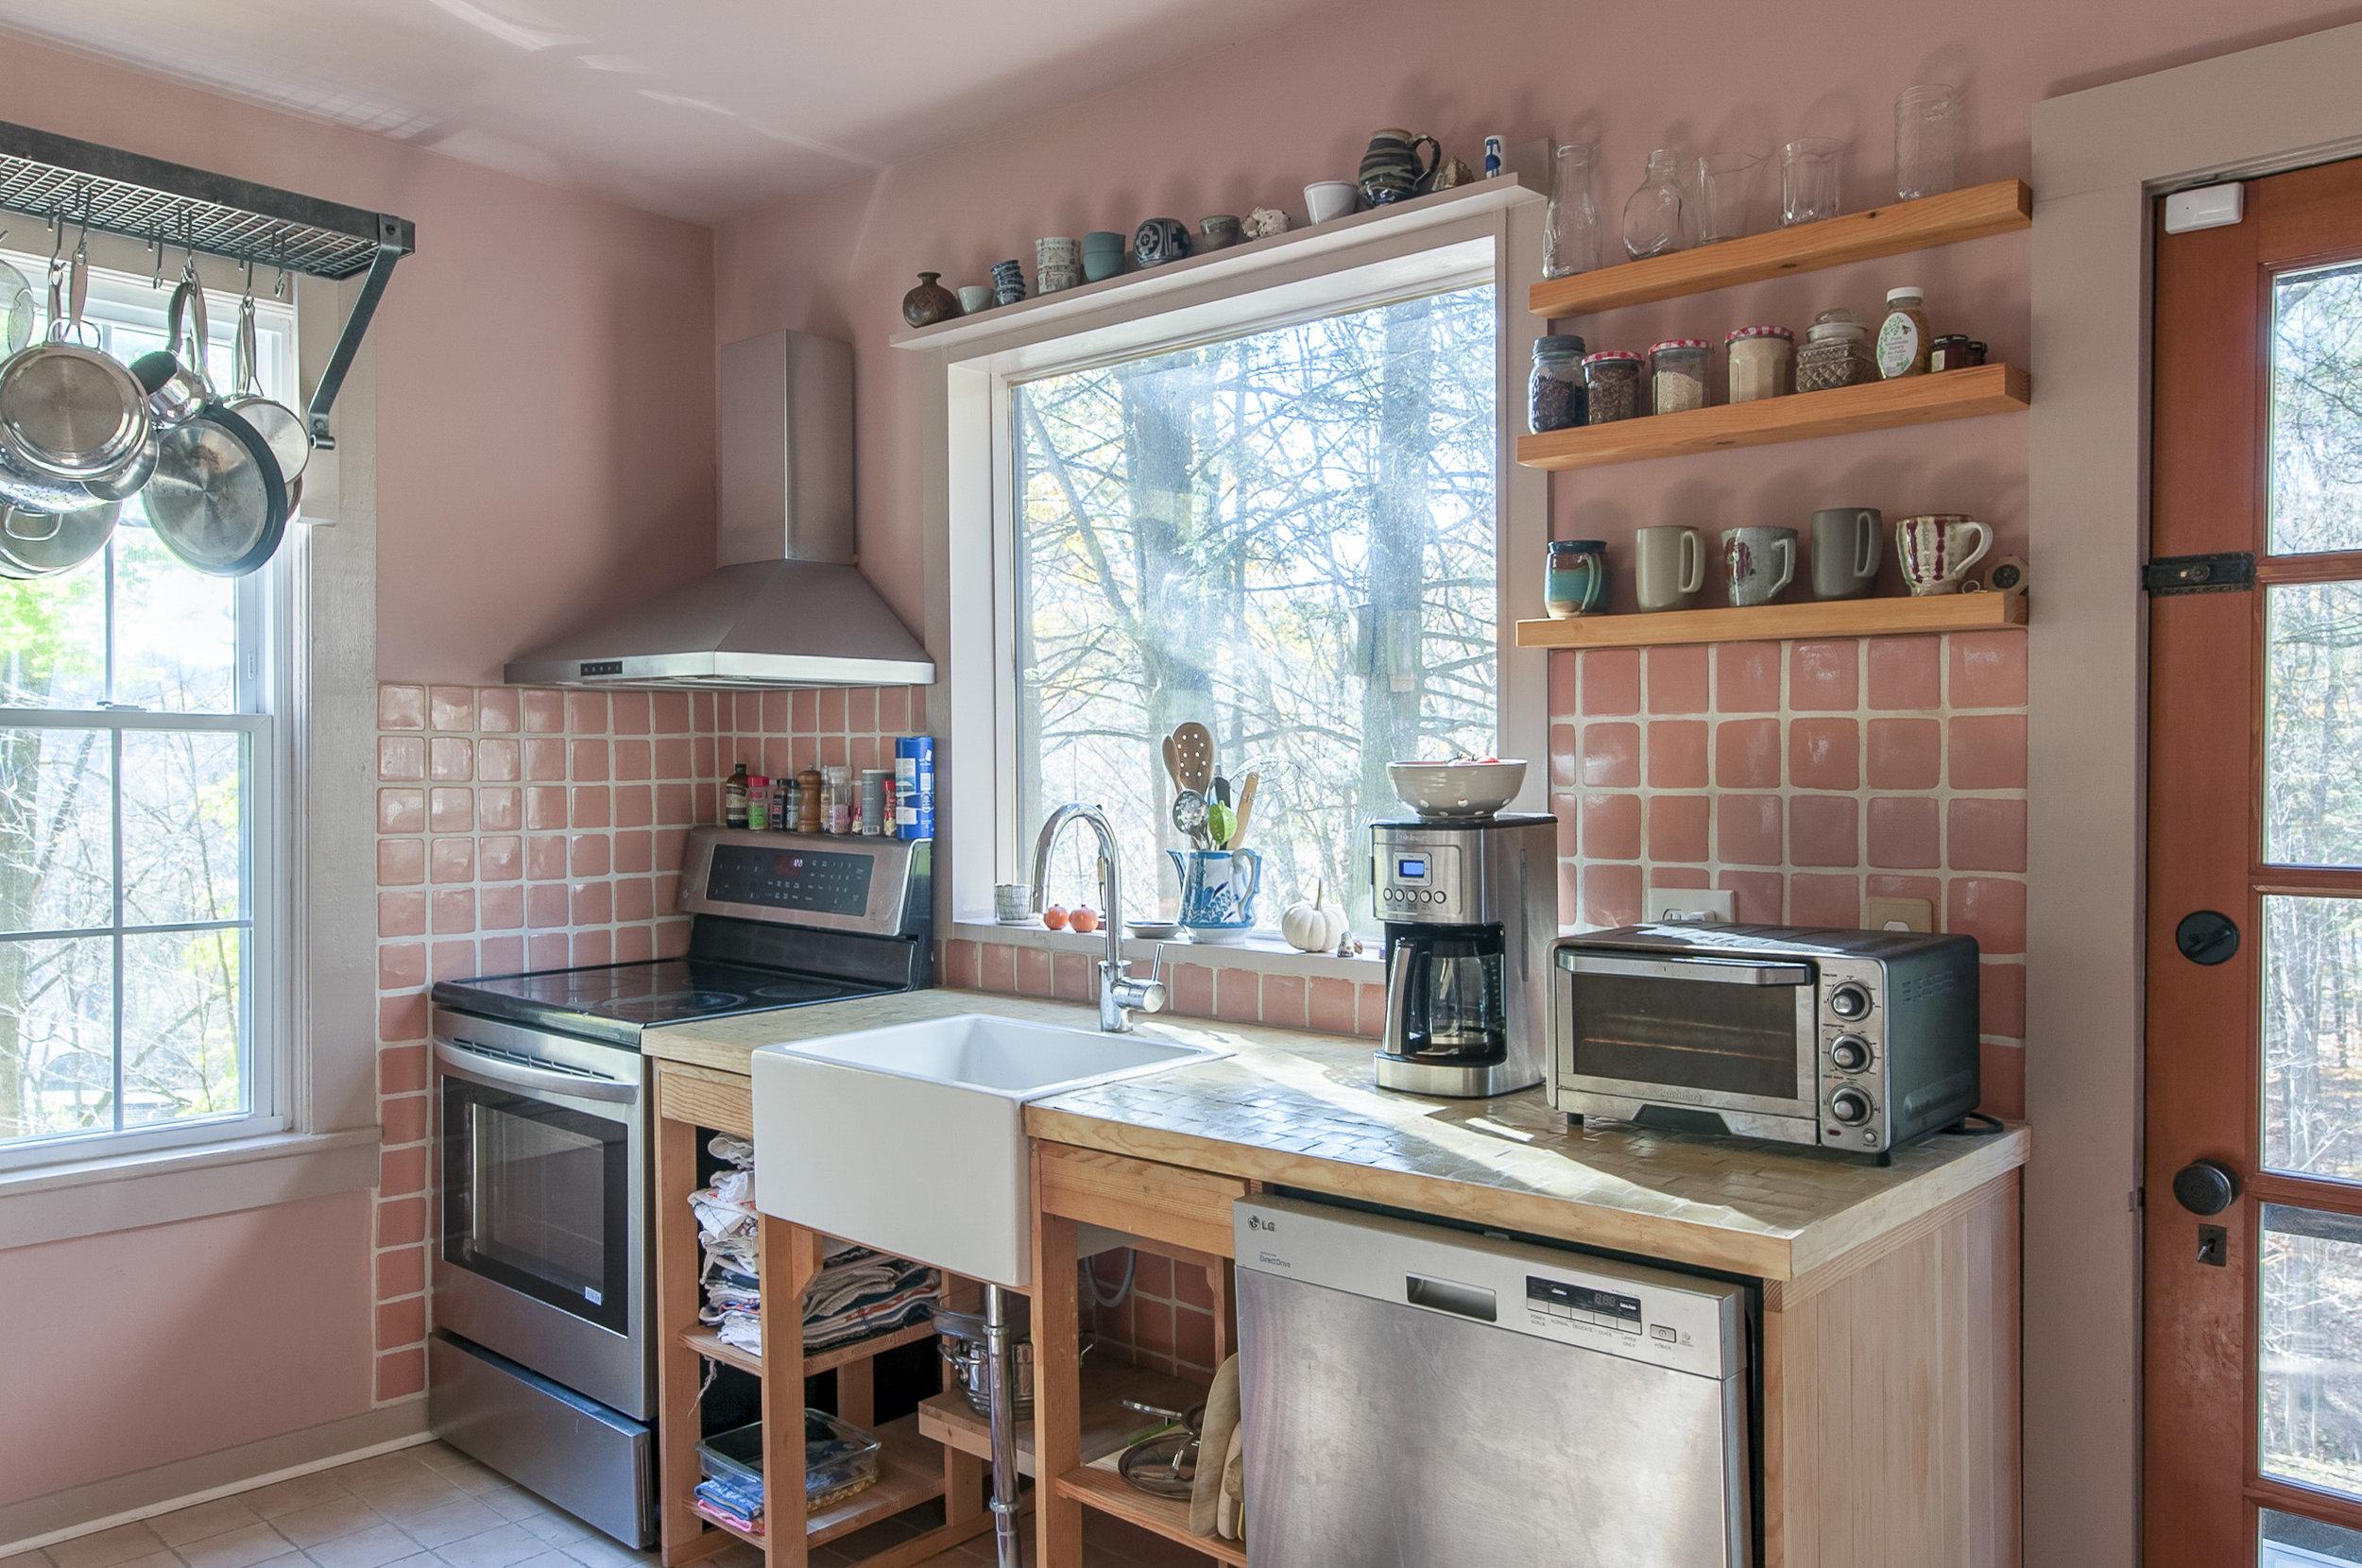 kitchenclose1.jpg